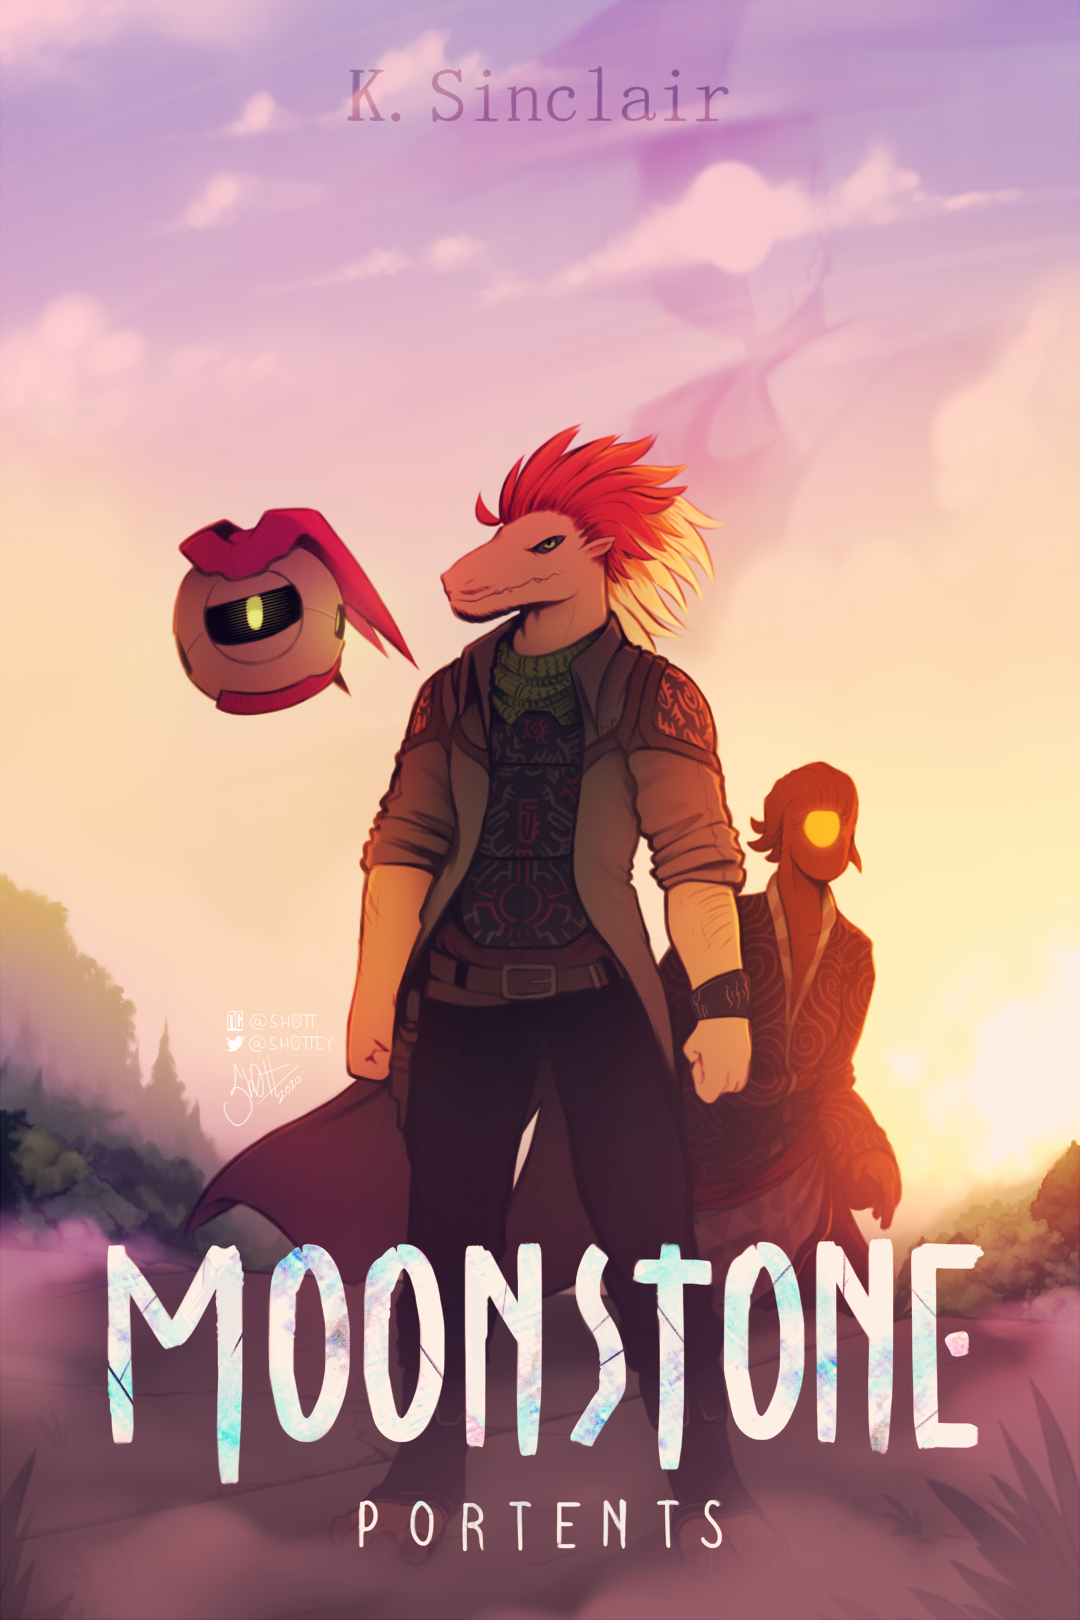 Book Cover - Moonstone Portents